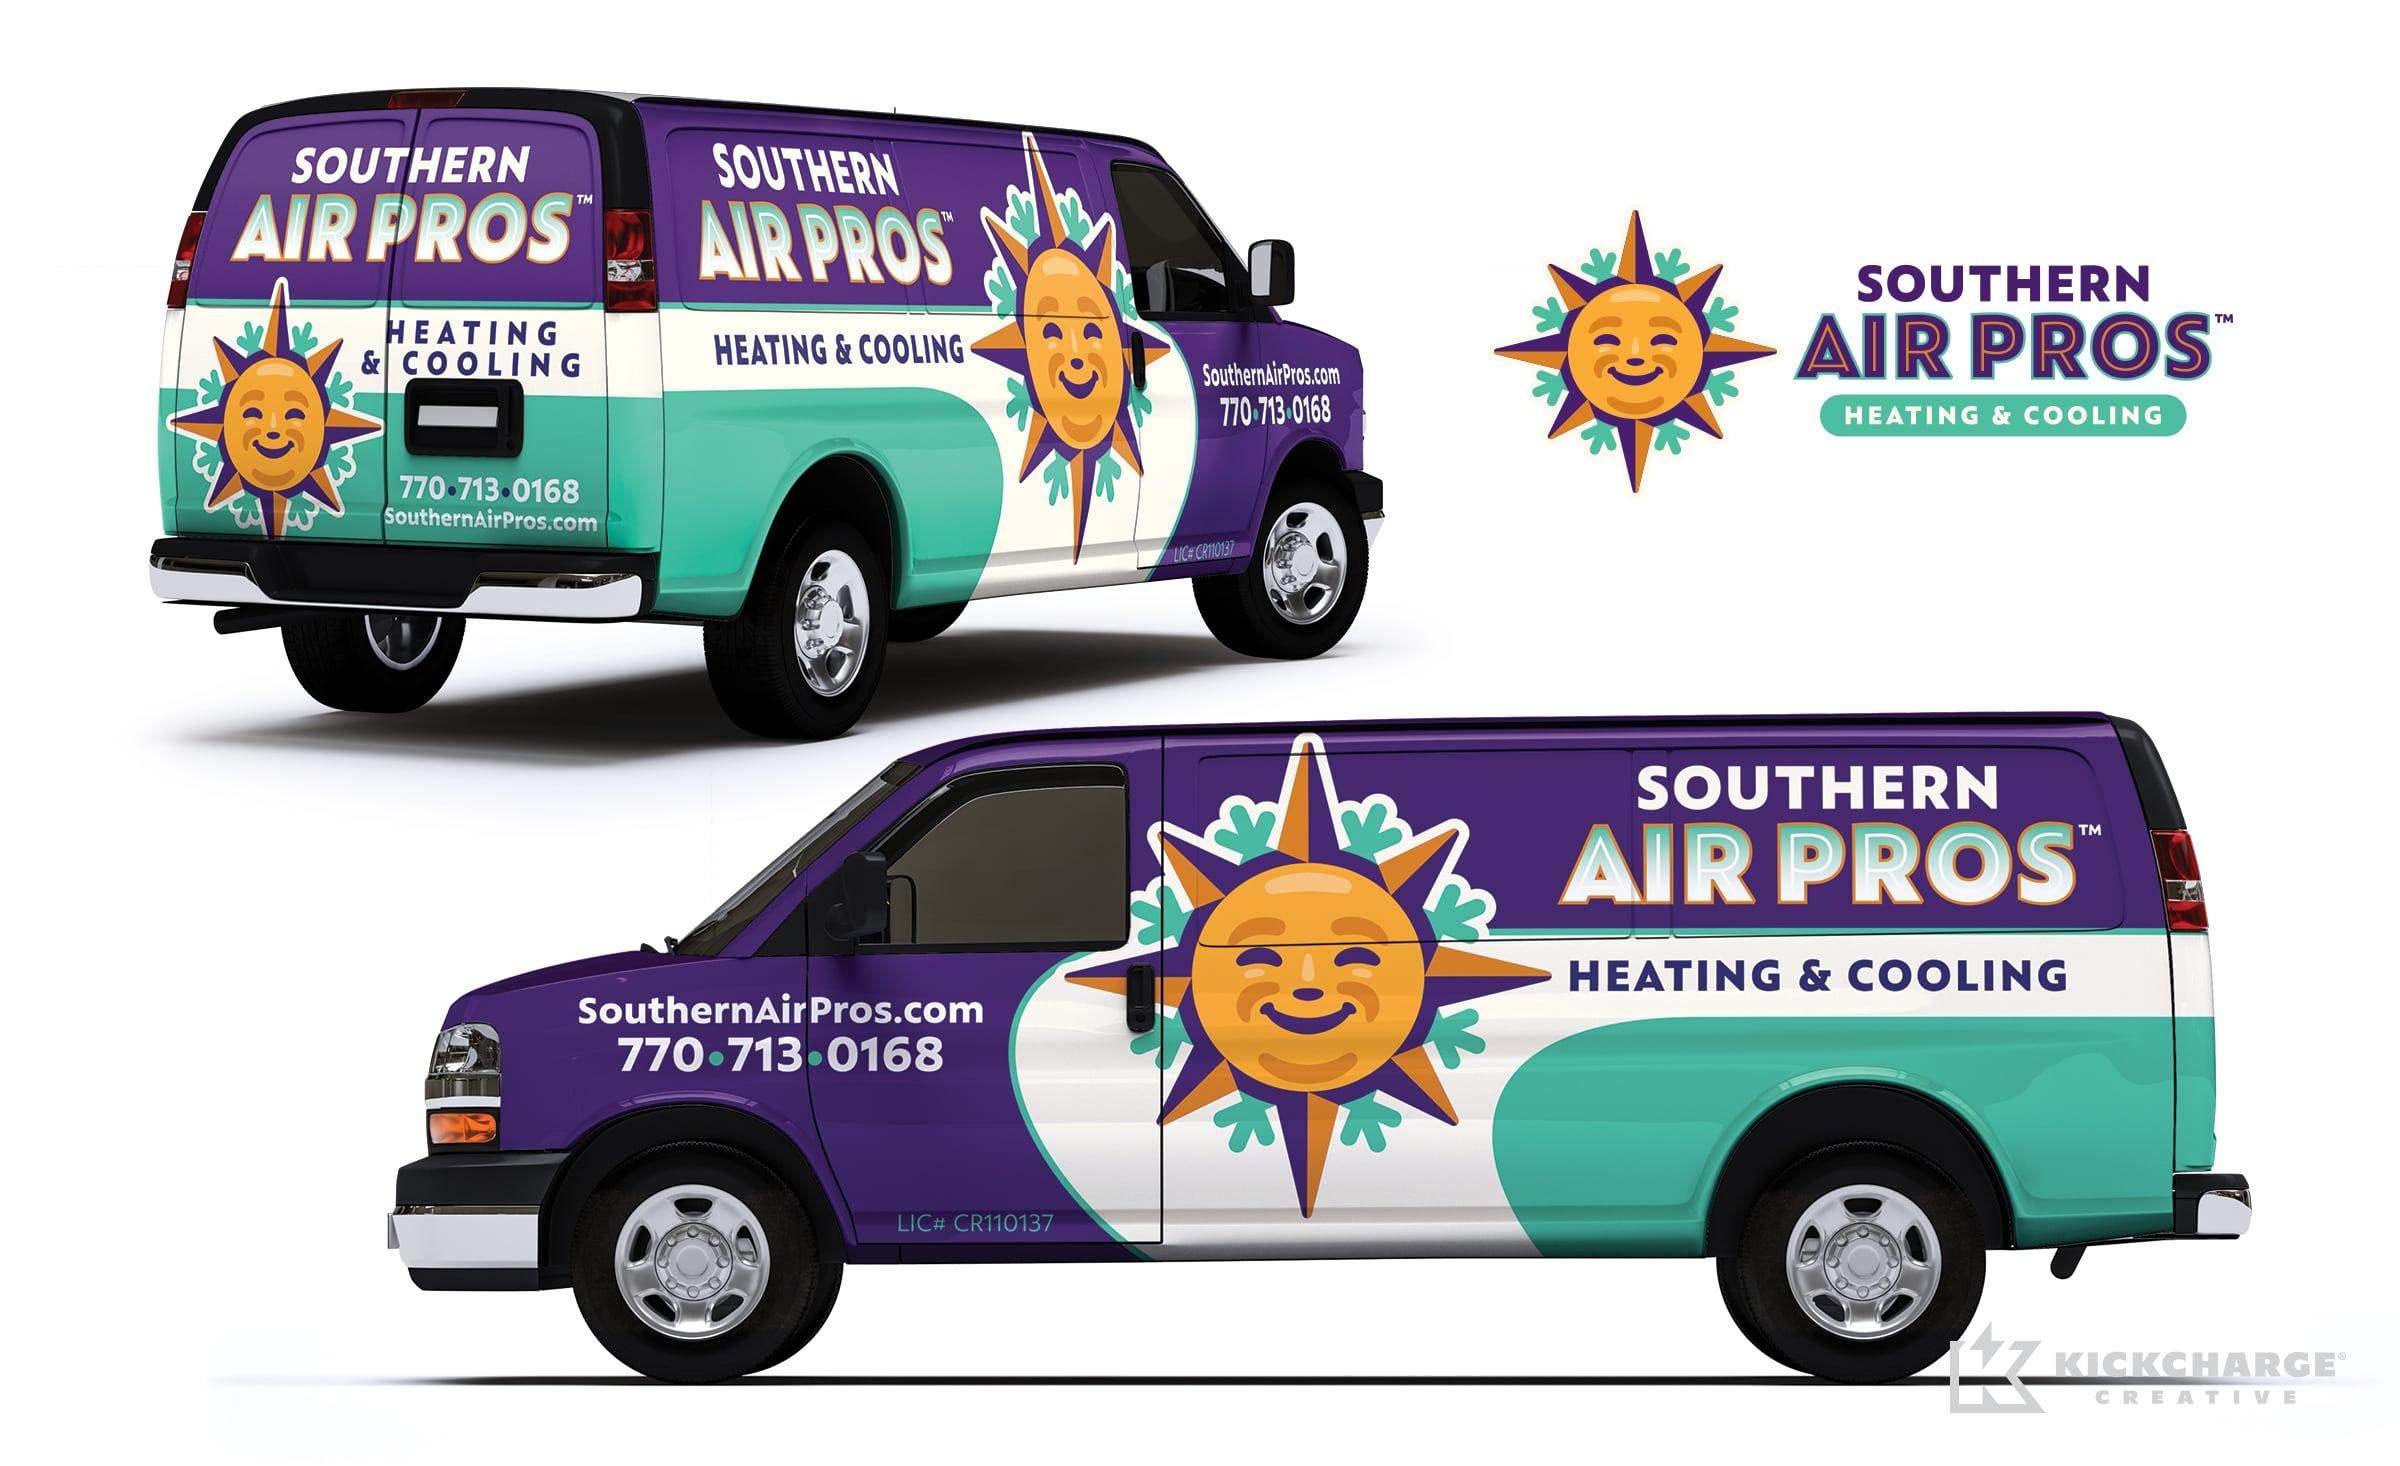 Southern Air Pros